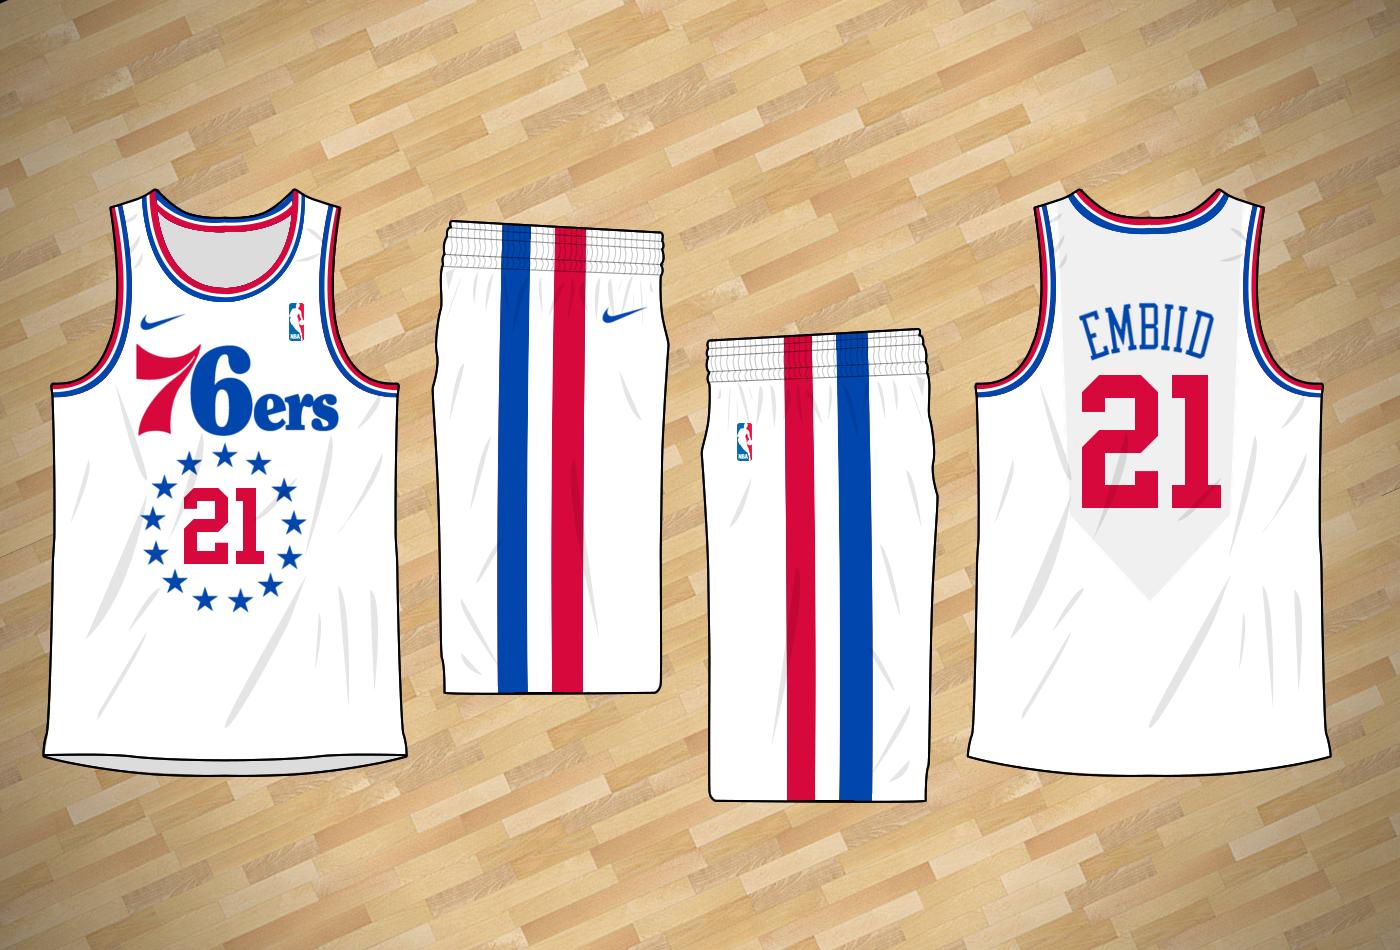 5bb8a10d4 NIKE x NBA - Concepts - Chris Creamer s Sports Logos Community ...